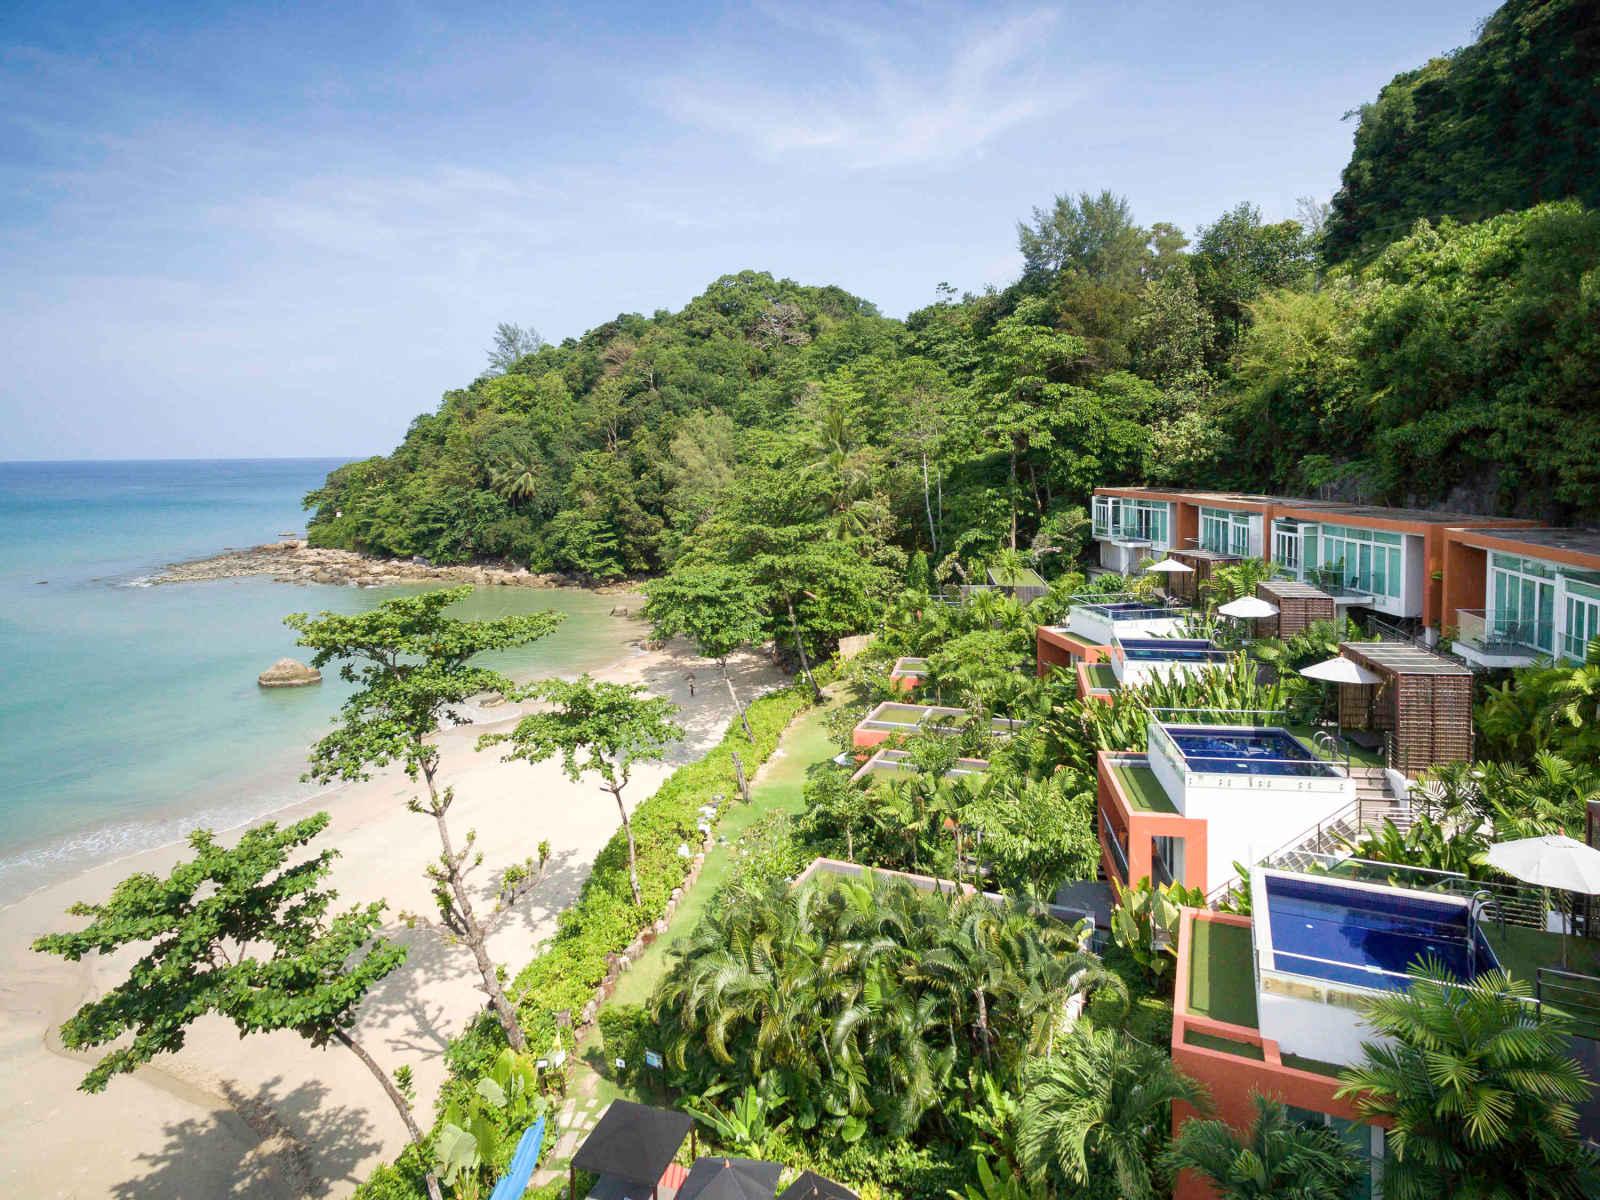 Novotel Phuket Kamala Beach - 4*